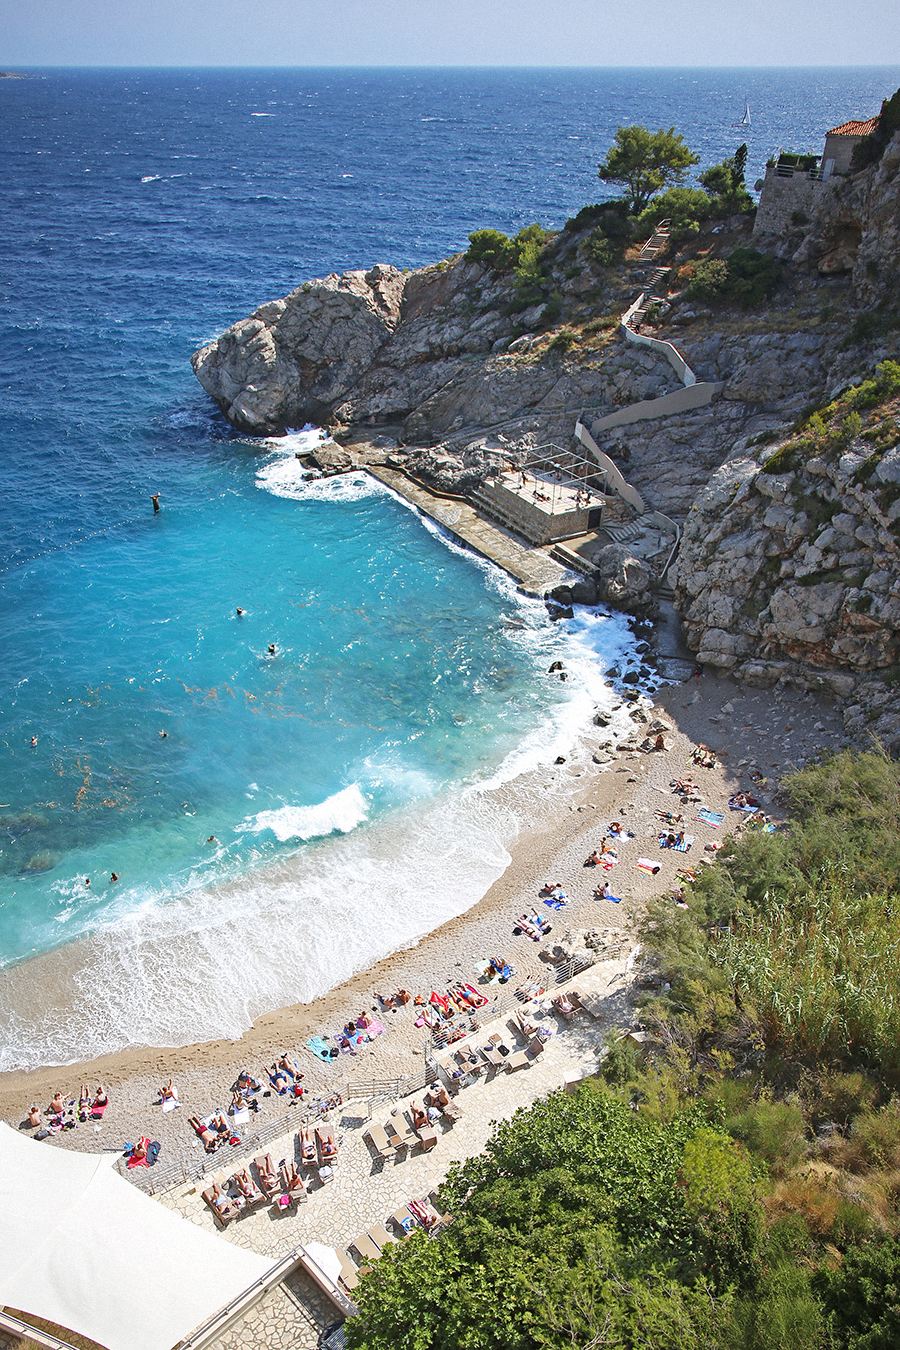 20 Days, 20 Cities, 6 Countries - Part 10: Dubrovnik, Croatia